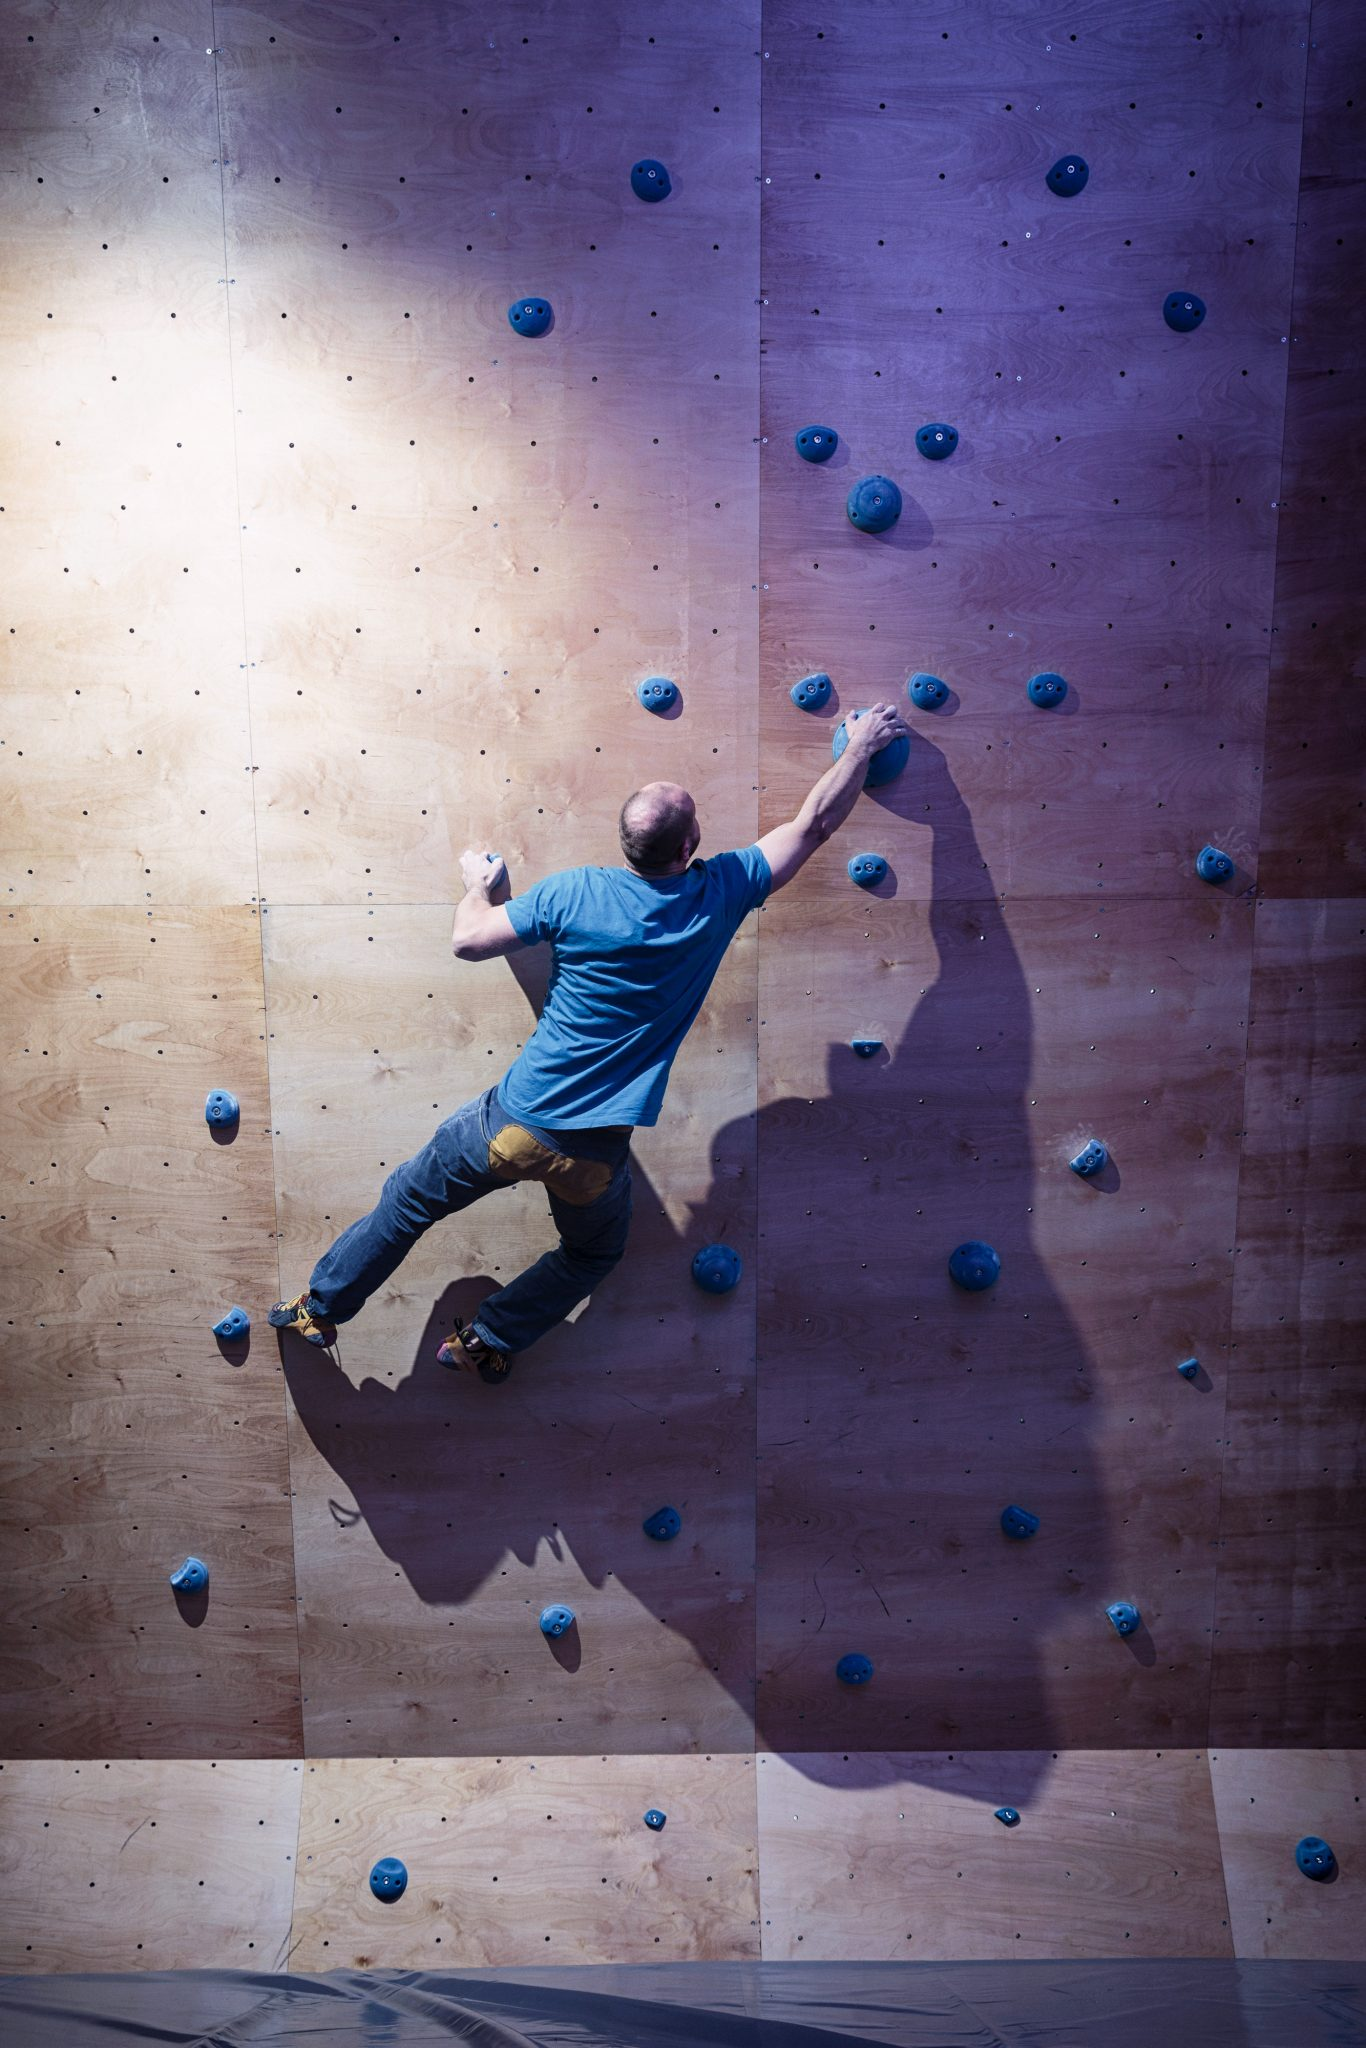 Kitka Climbing - climbing holds